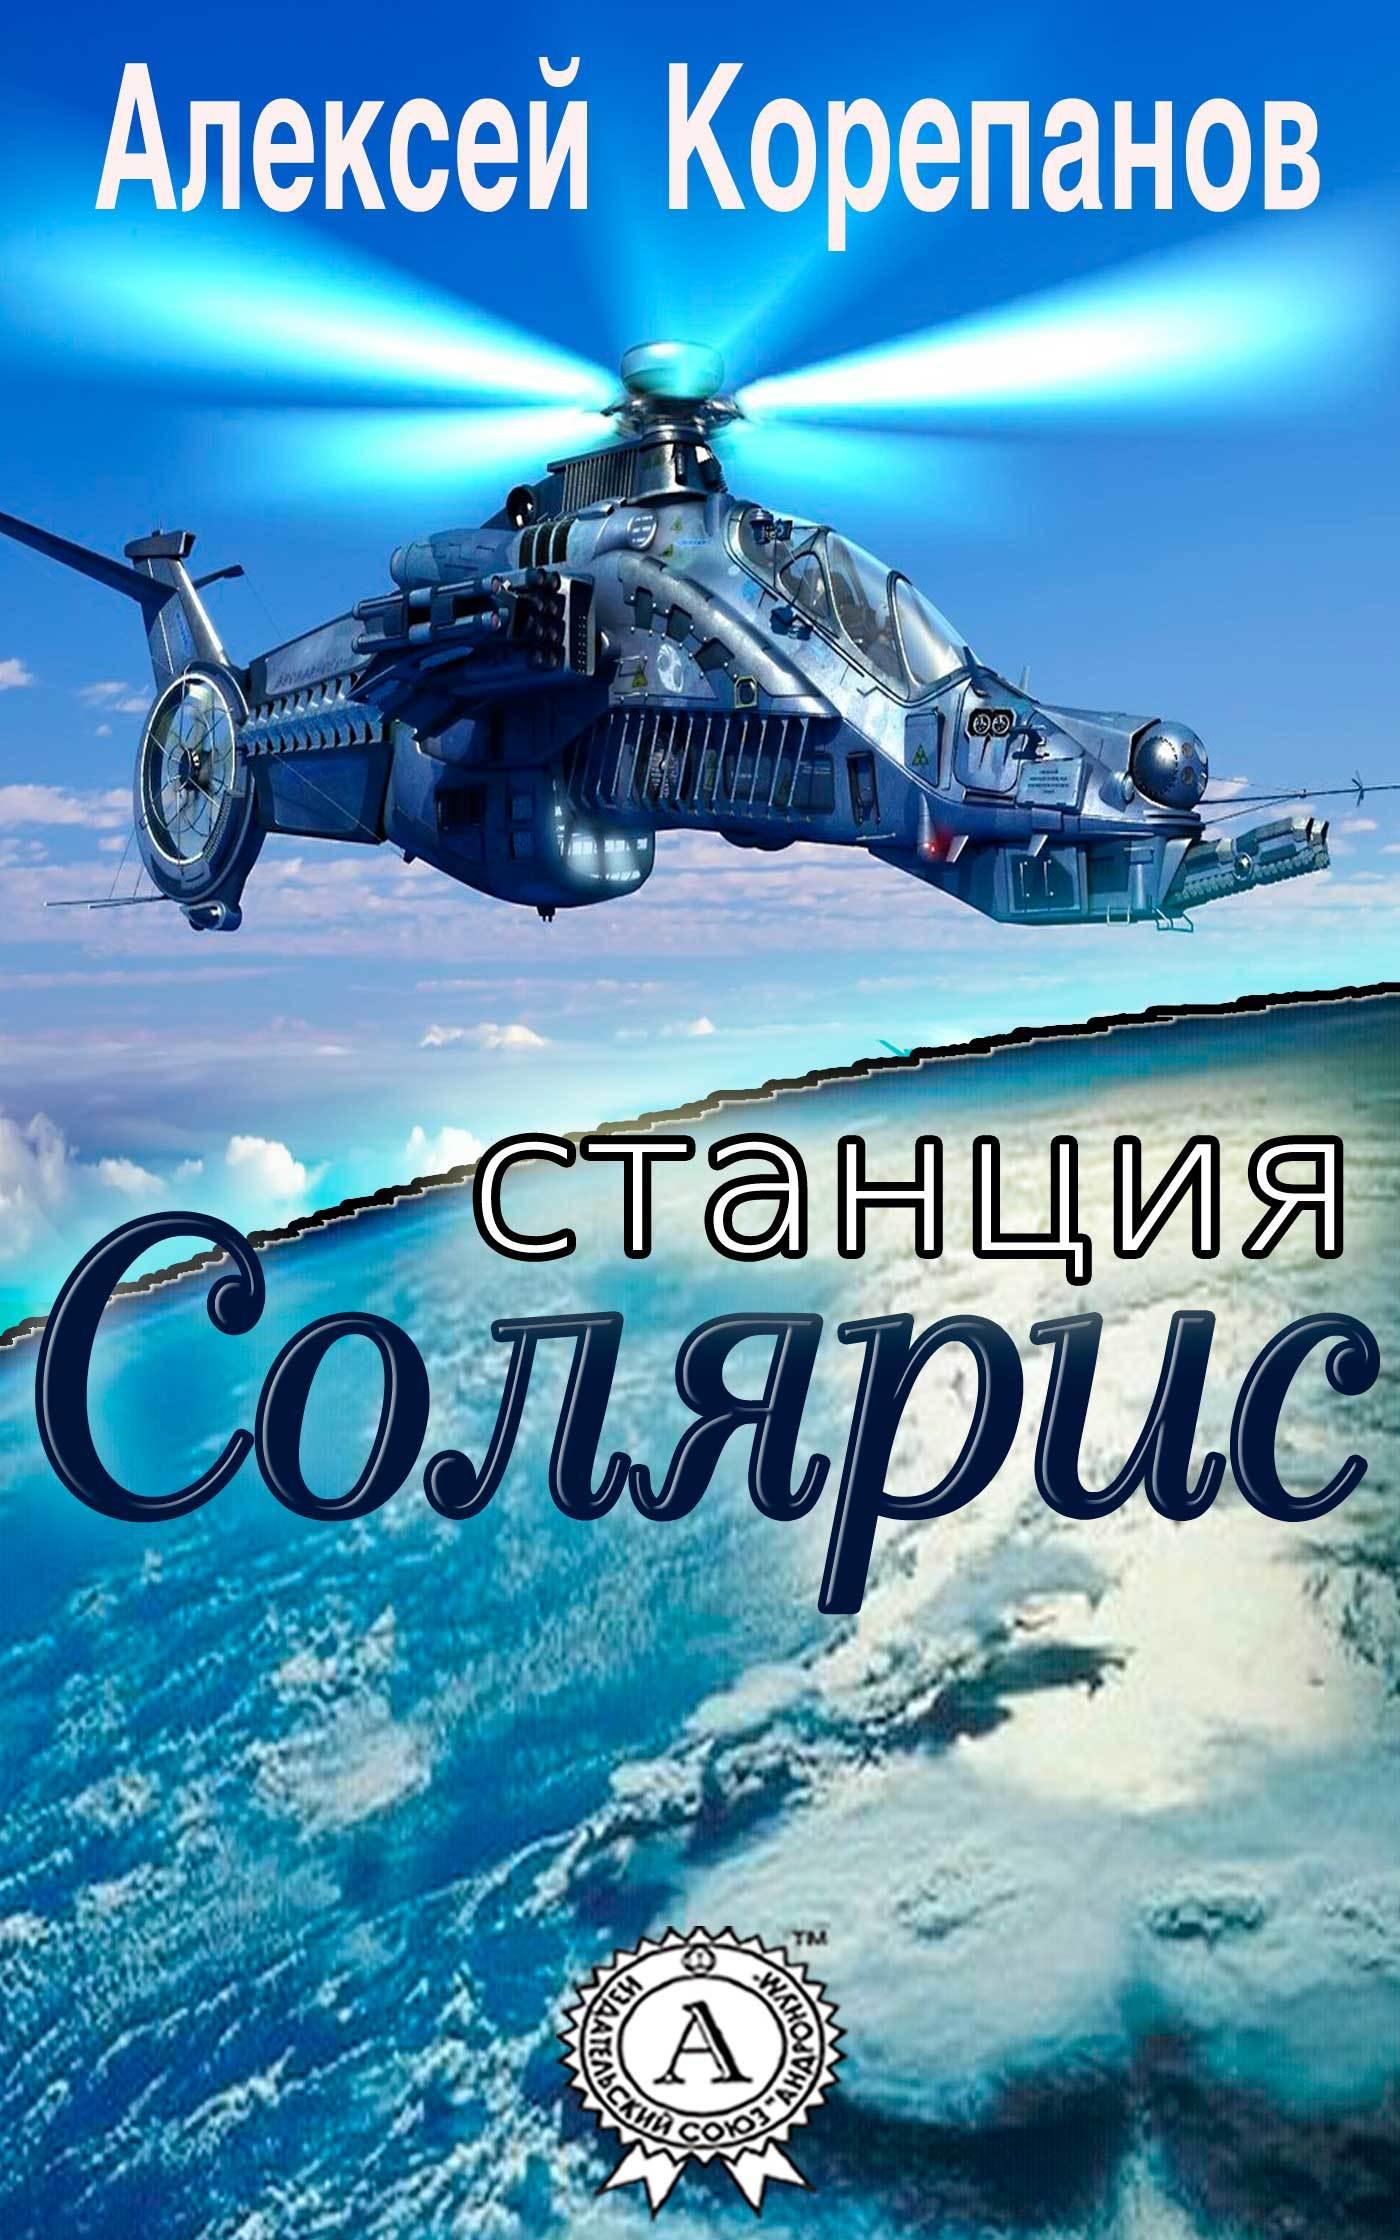 Алексей Корепанов Станция Солярис